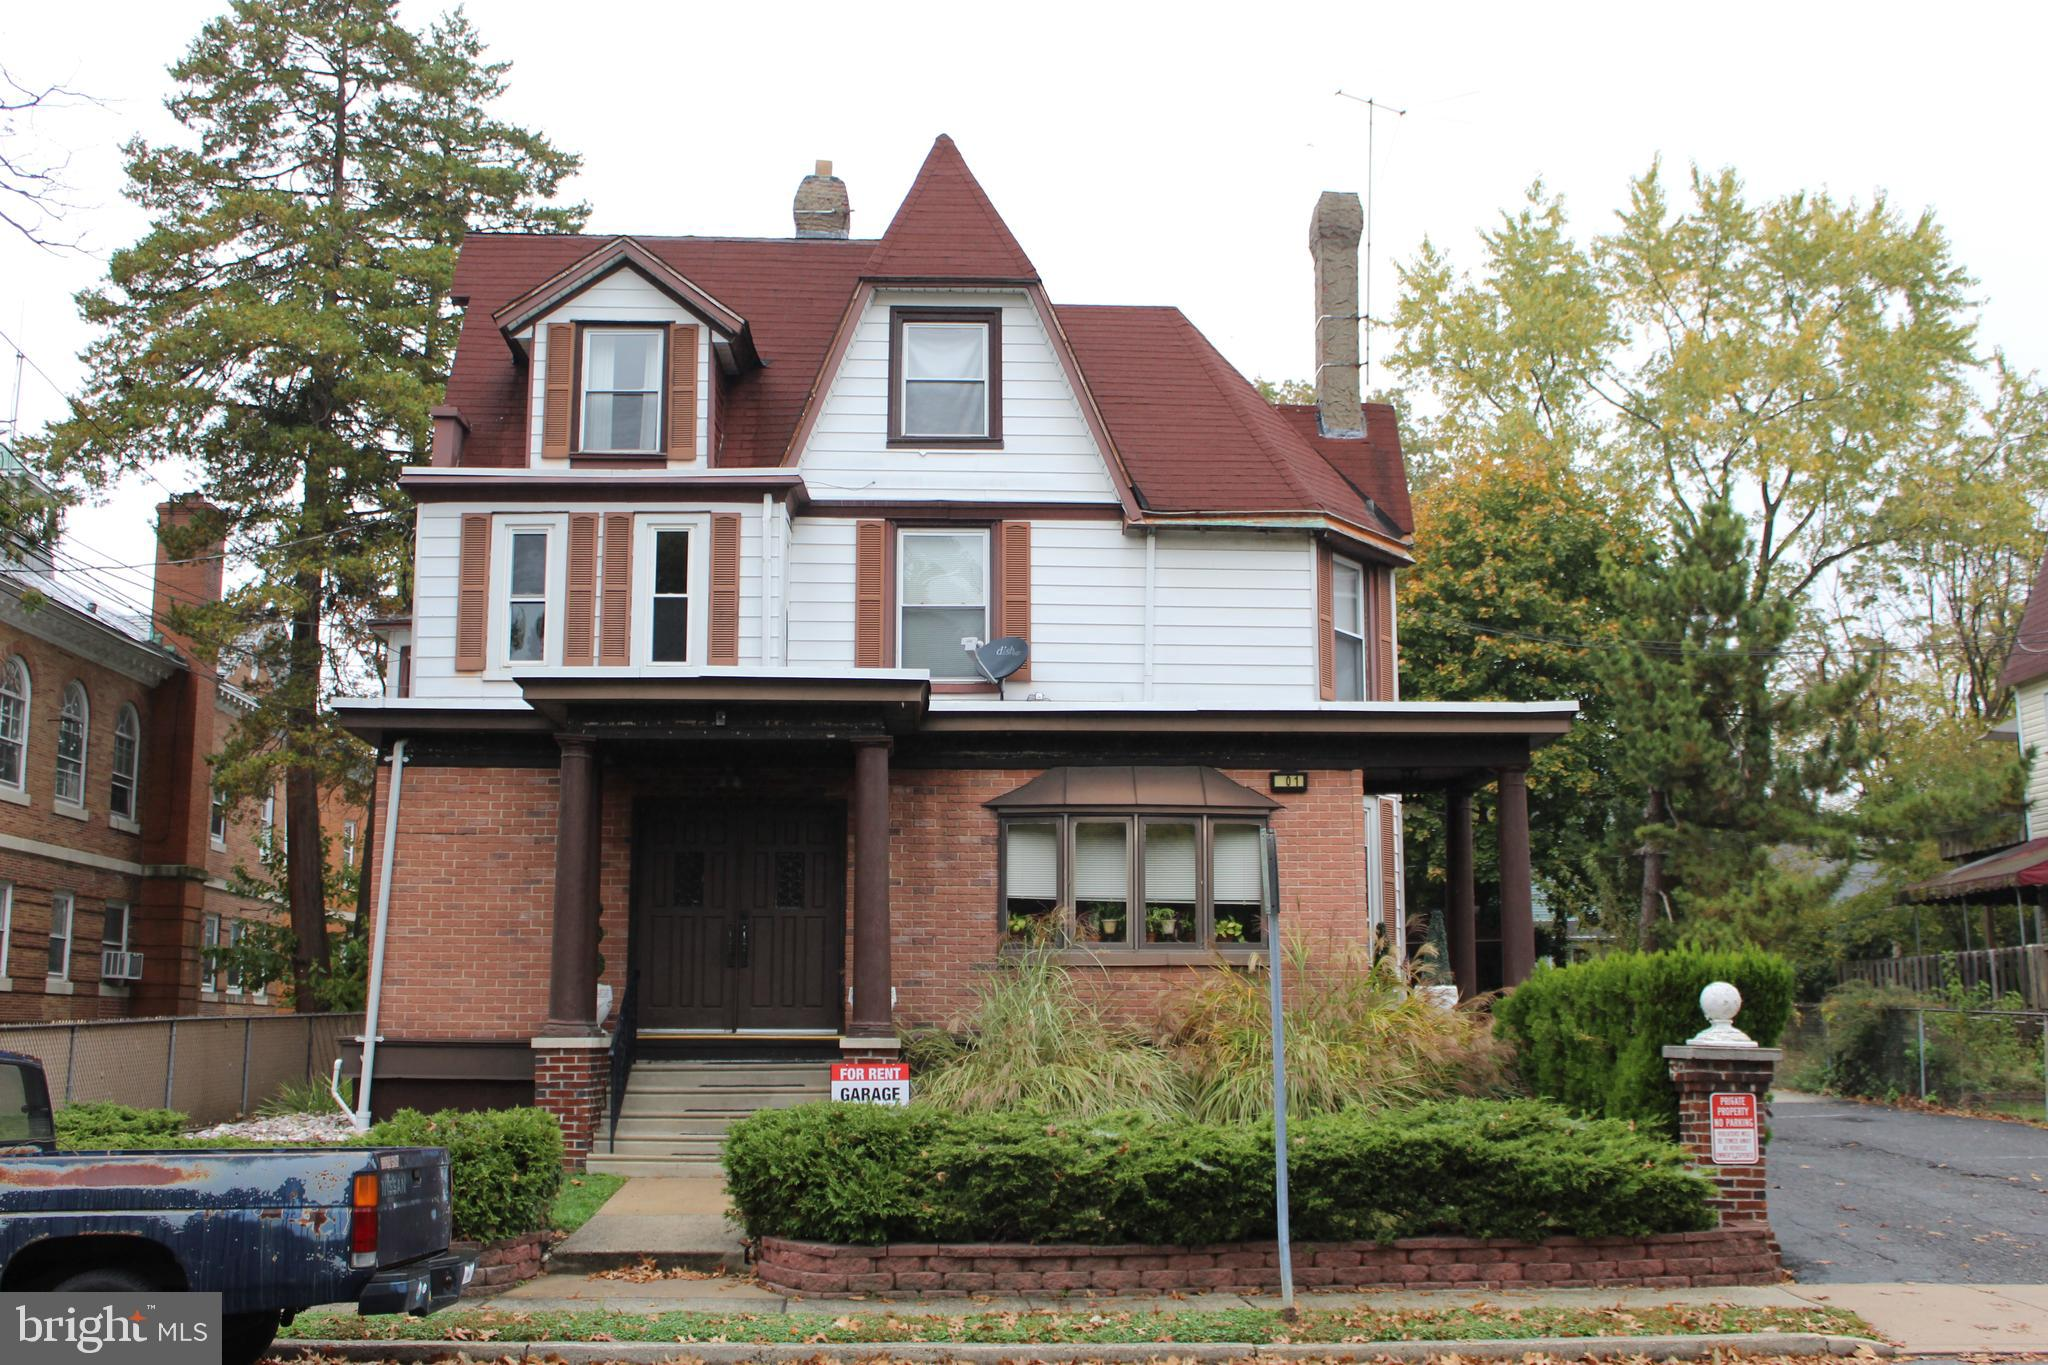 101 CRESSWELL STREET, RIDLEY PARK, PA 19078